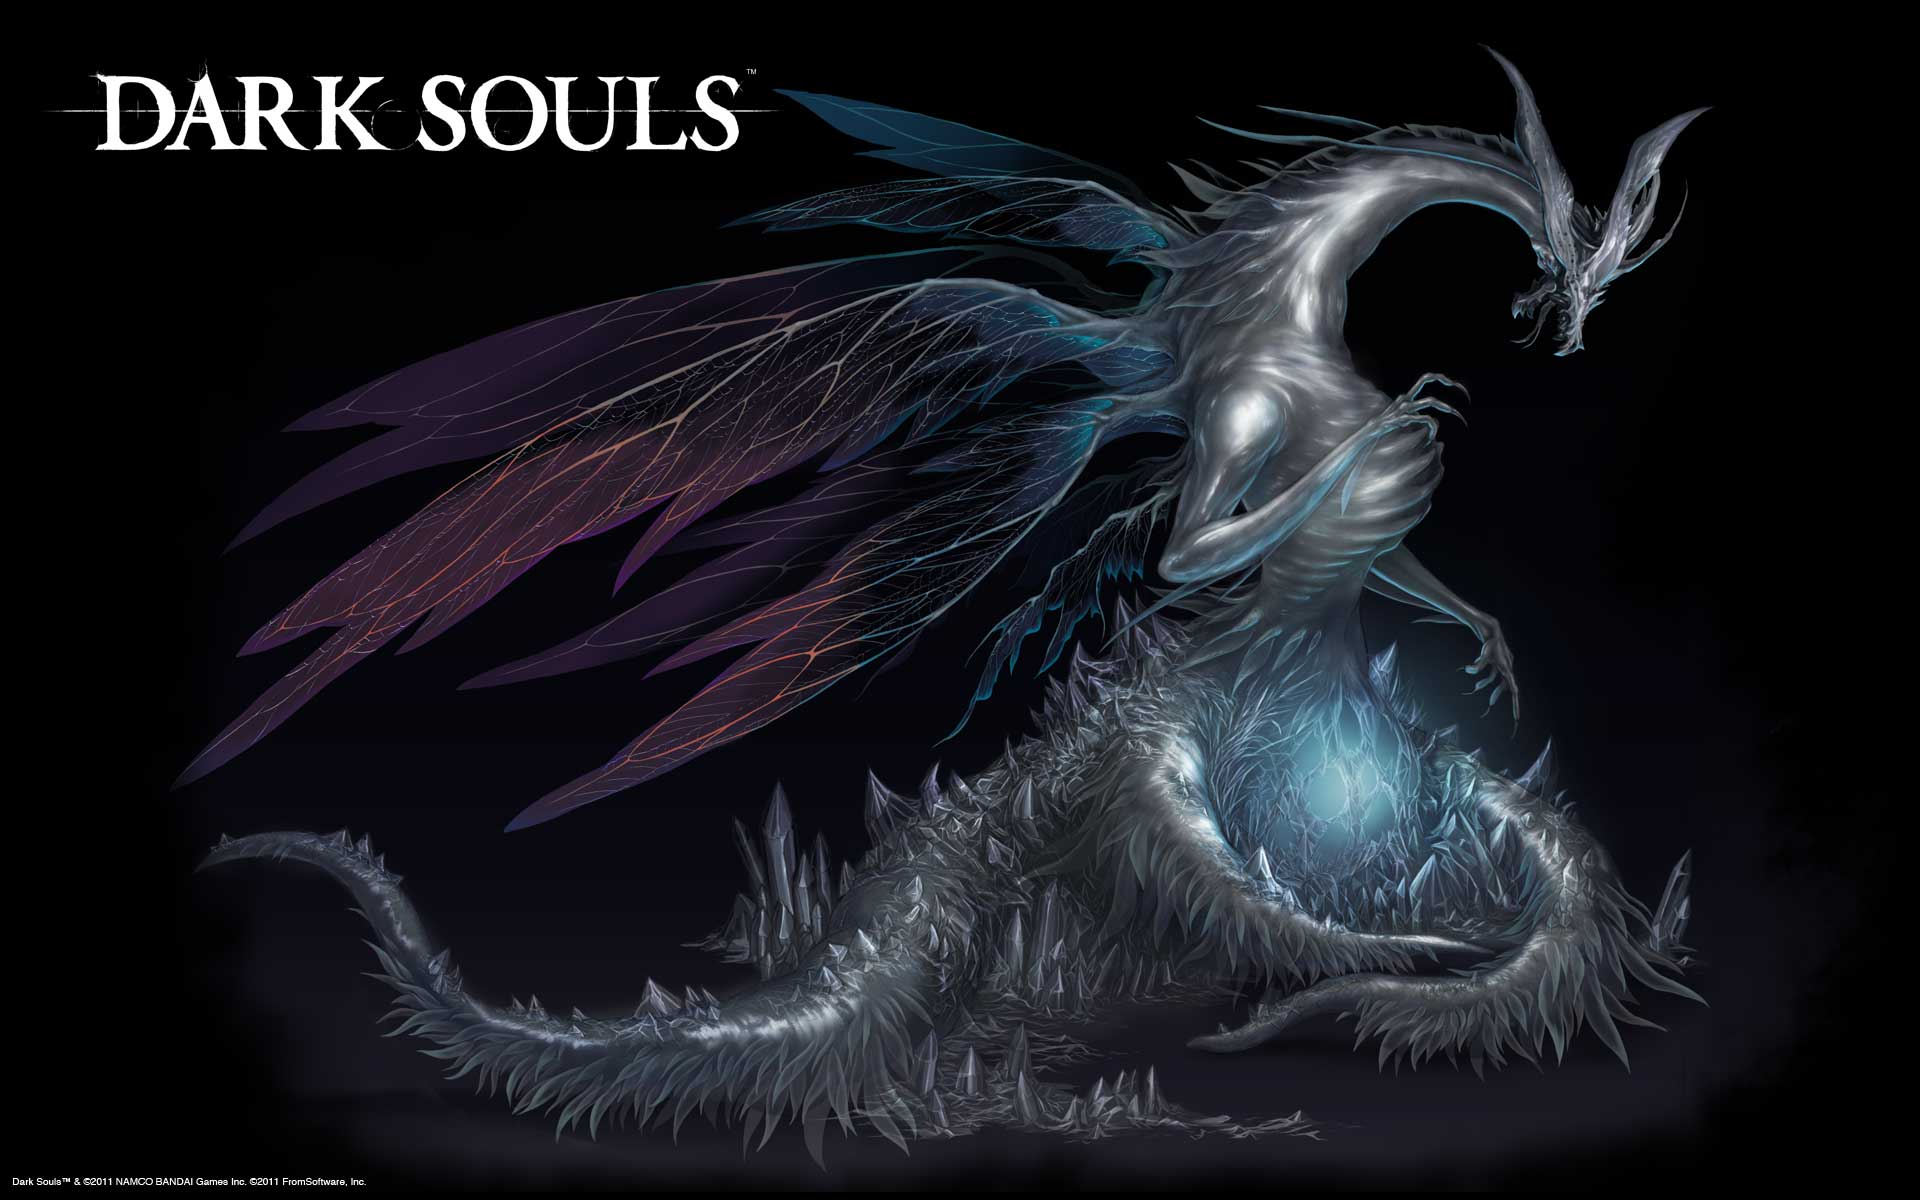 Wallpapers dark souls wiki dark souls wallpapers voltagebd Image collections